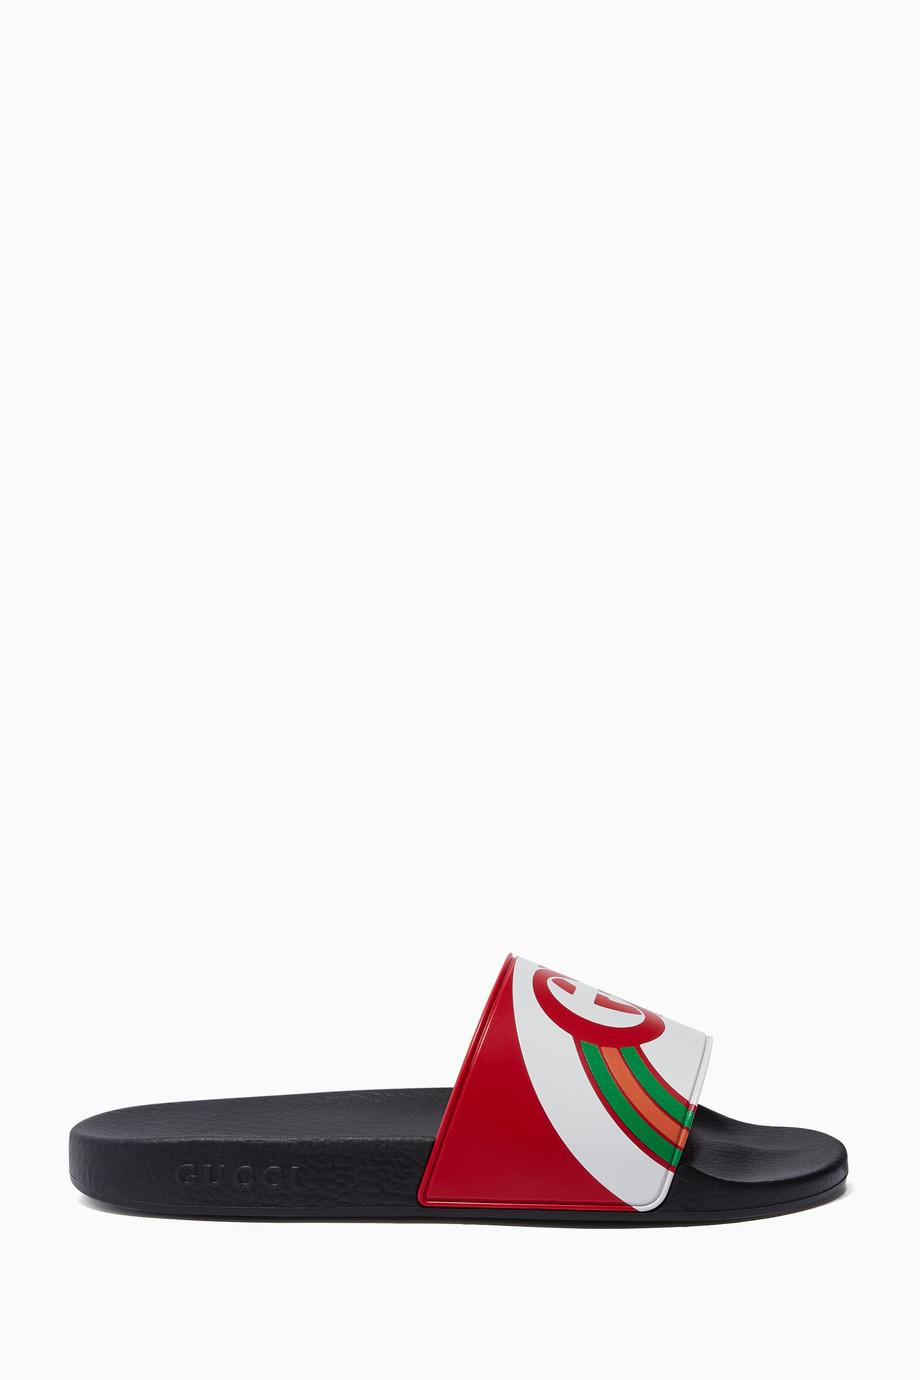 bf1902eb050 Shop Gucci Red Red Pursuit GG Logo Slides for Men